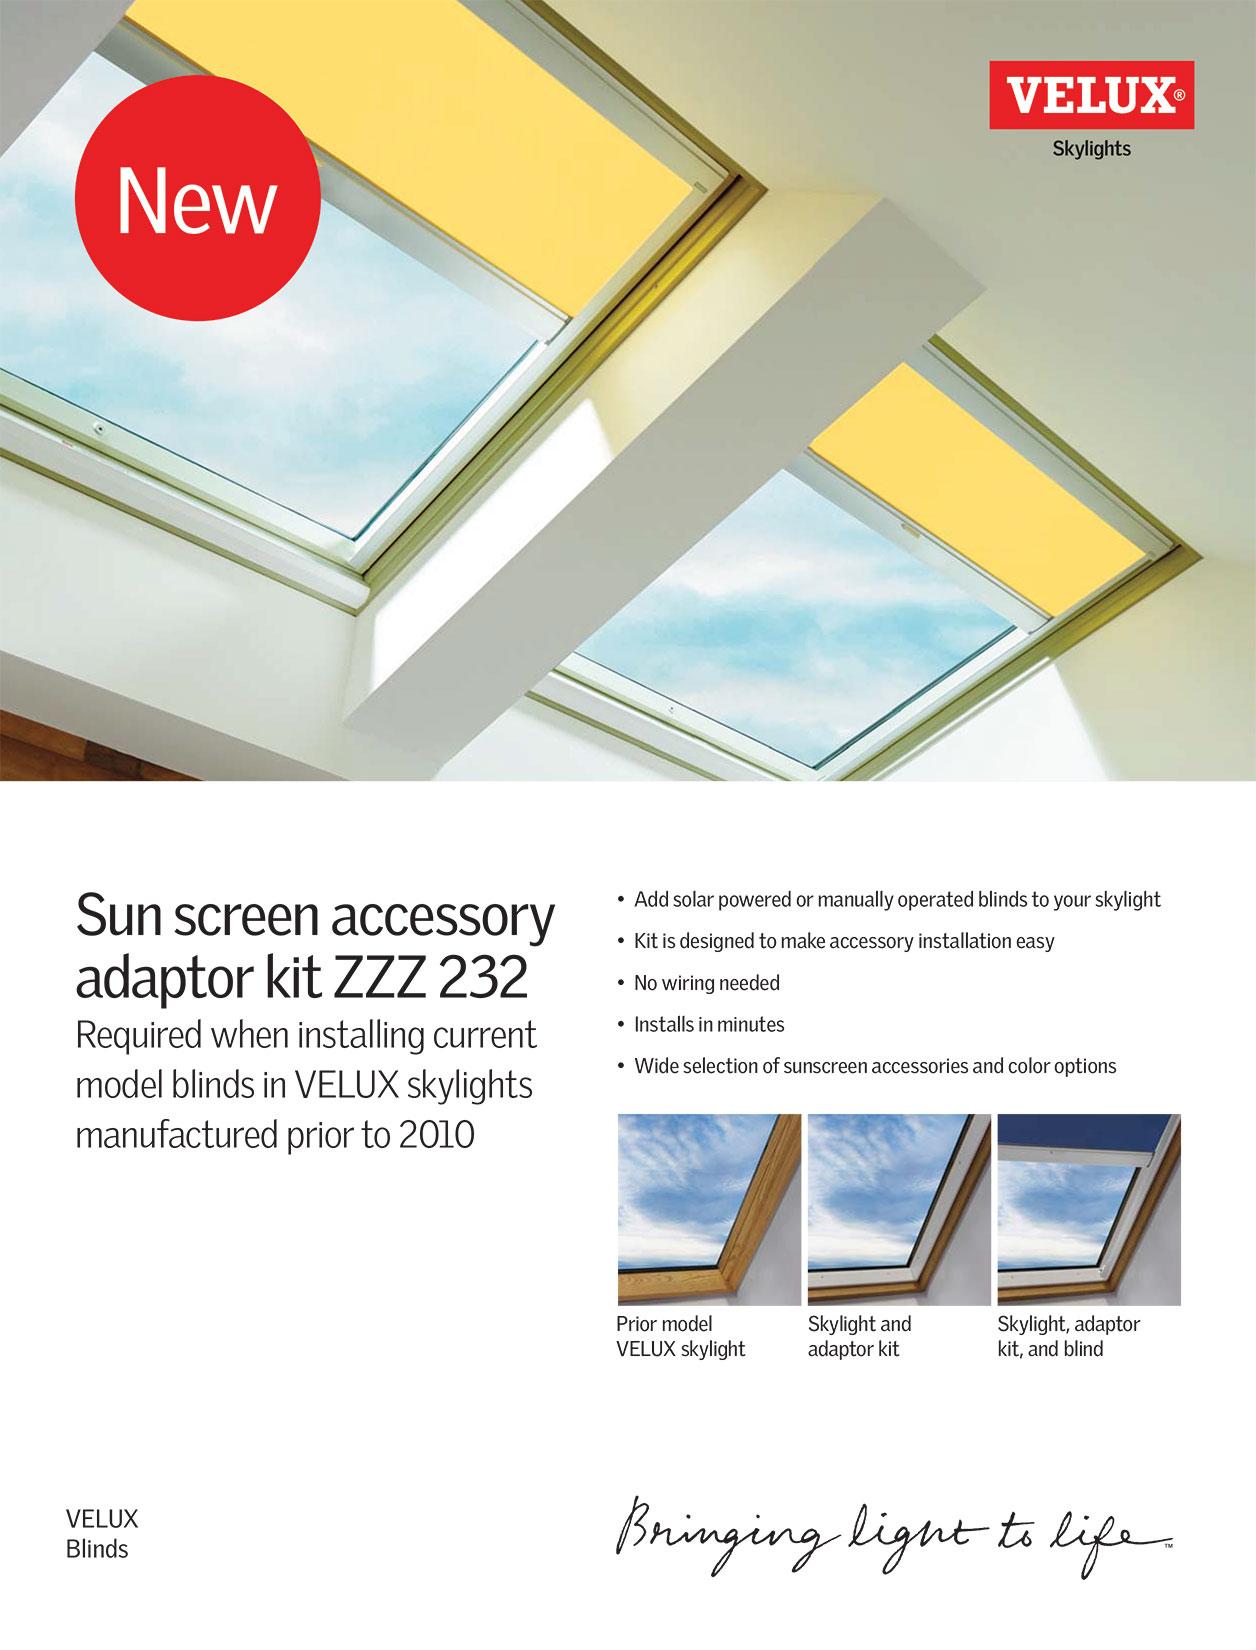 Sunscreen adapter kit flyer